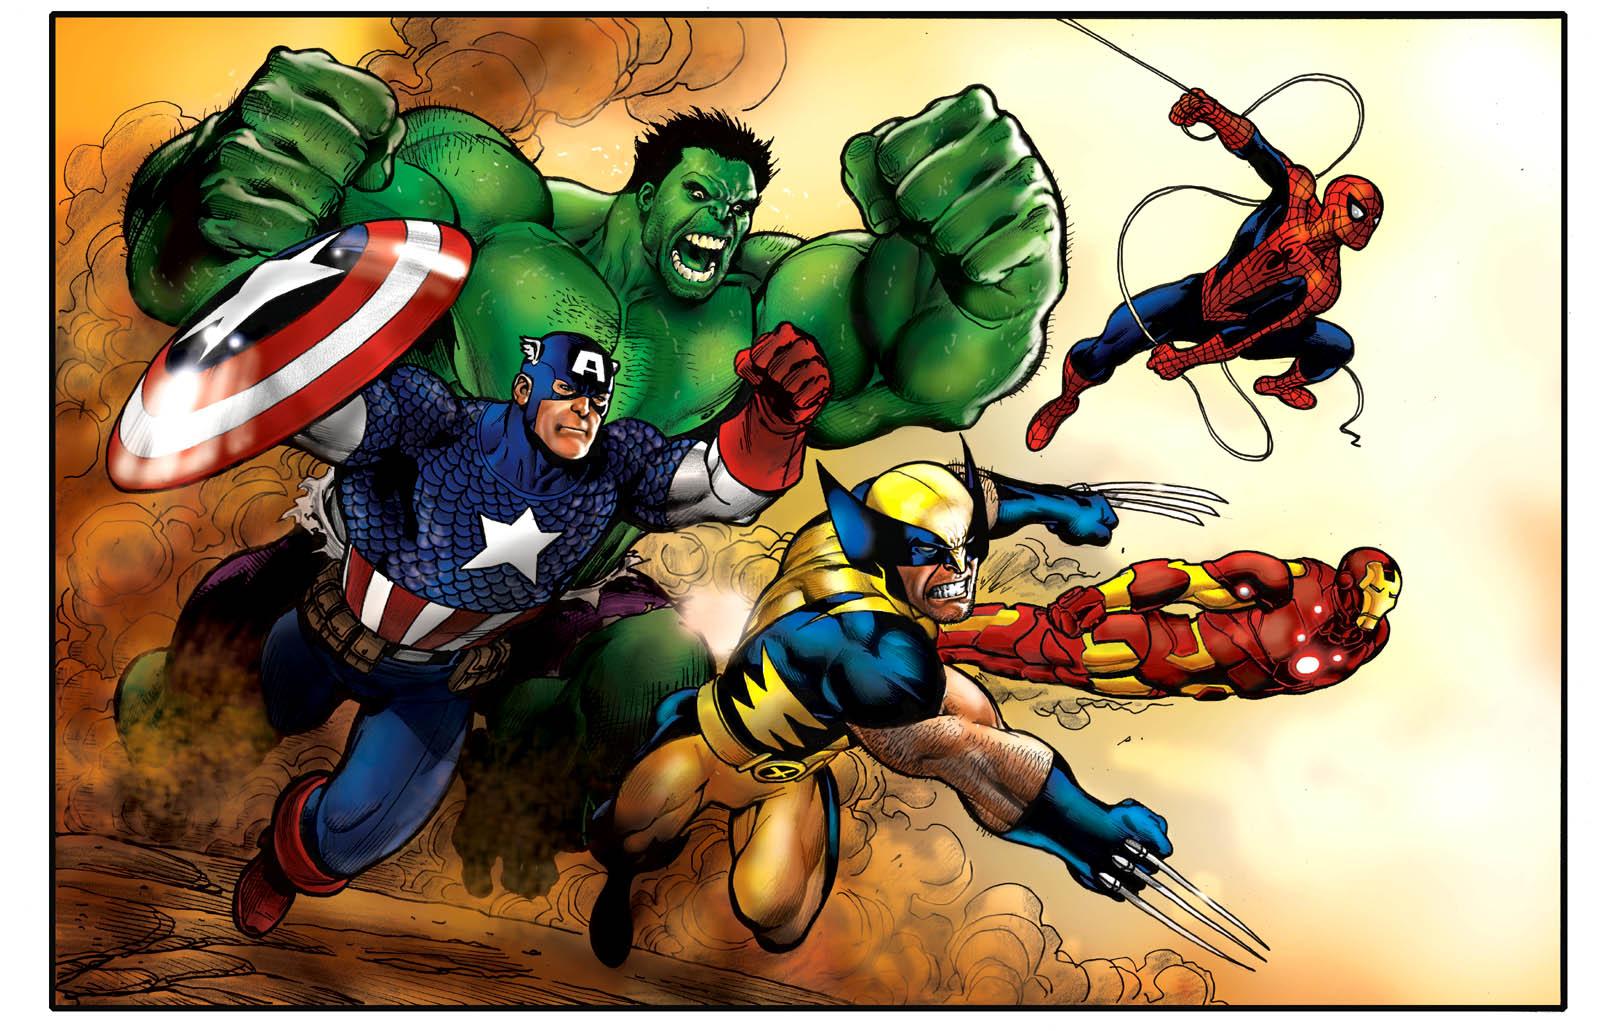 marvel comics wallpaper spider - photo #20